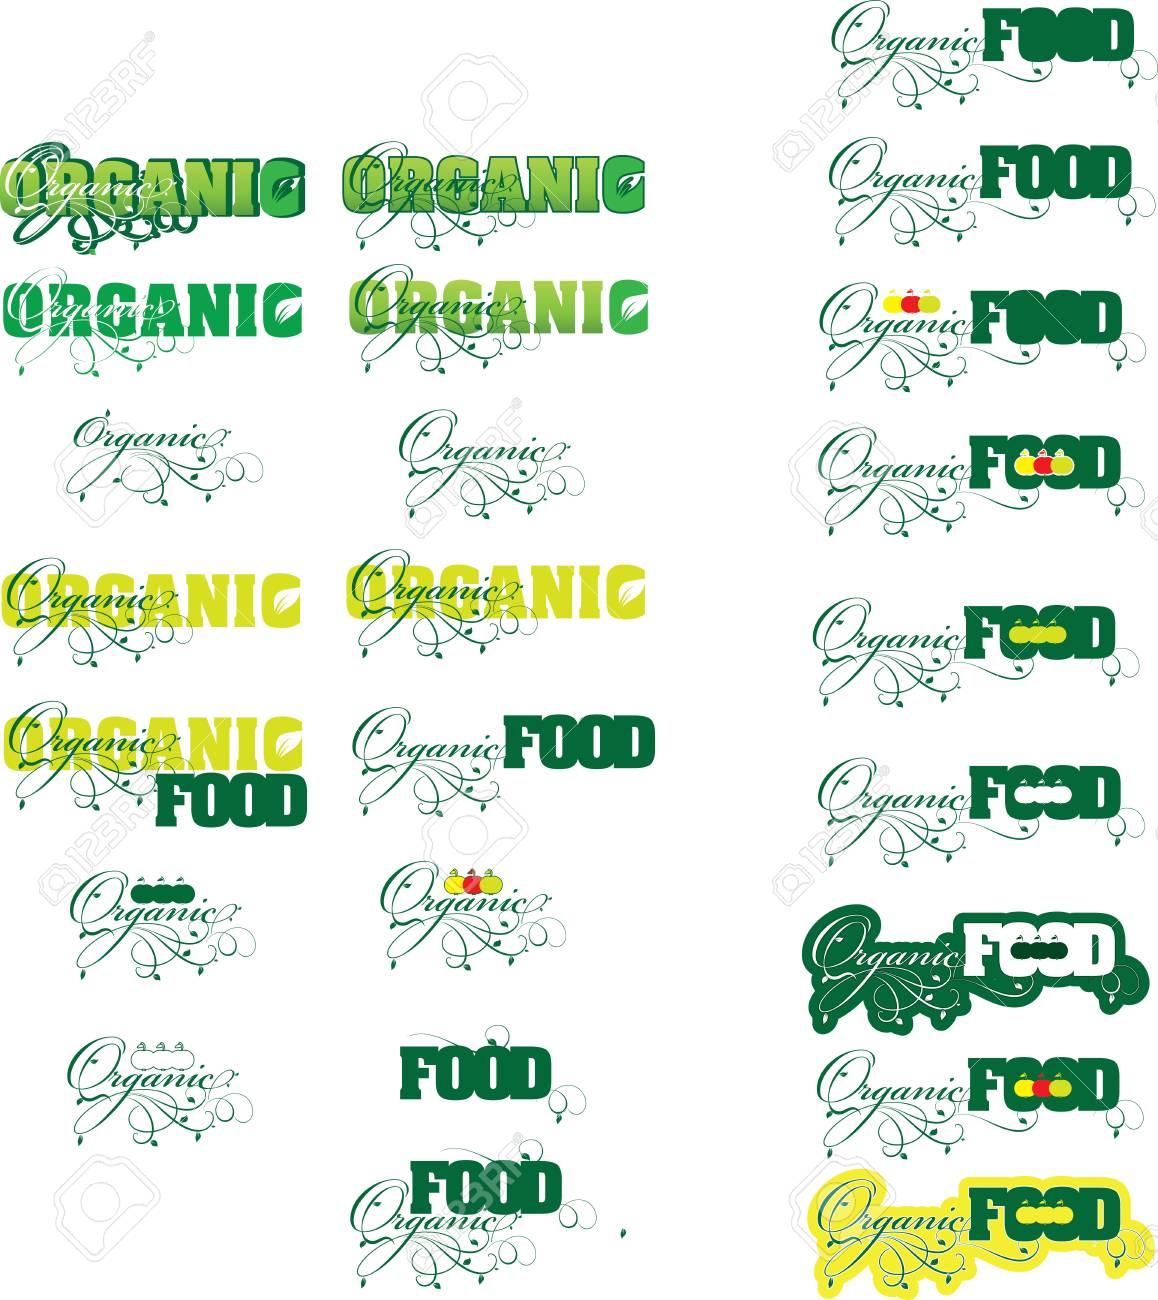 Organic food Stock Vector - 22069728